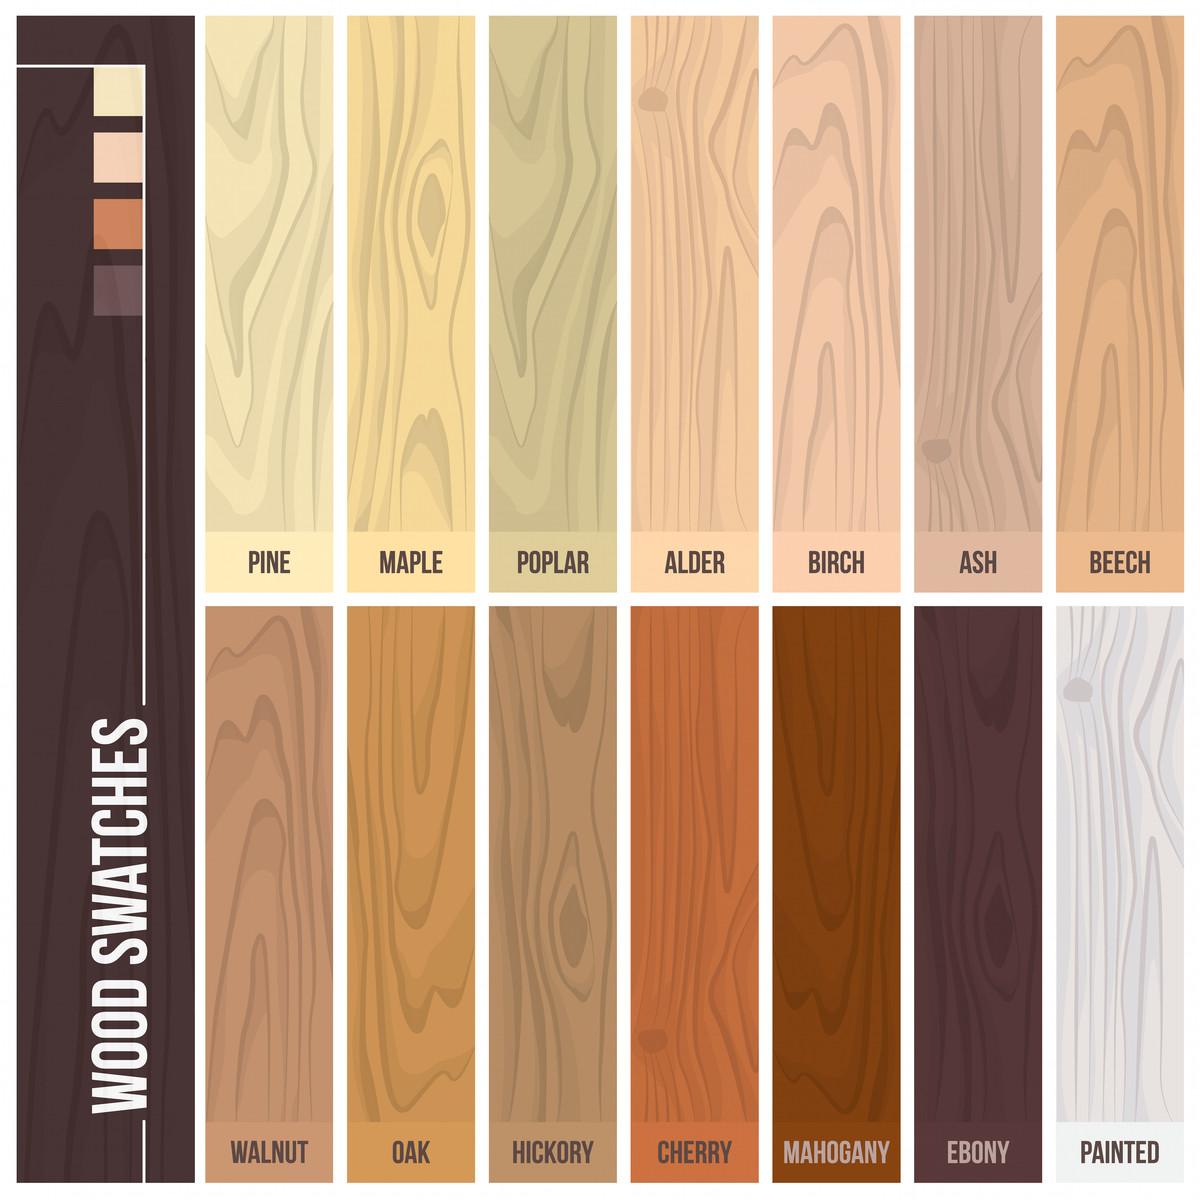 hardwood flooring countertops diy of 12 types of hardwood flooring species styles edging dimensions within types of hardwood flooring illustrated guide